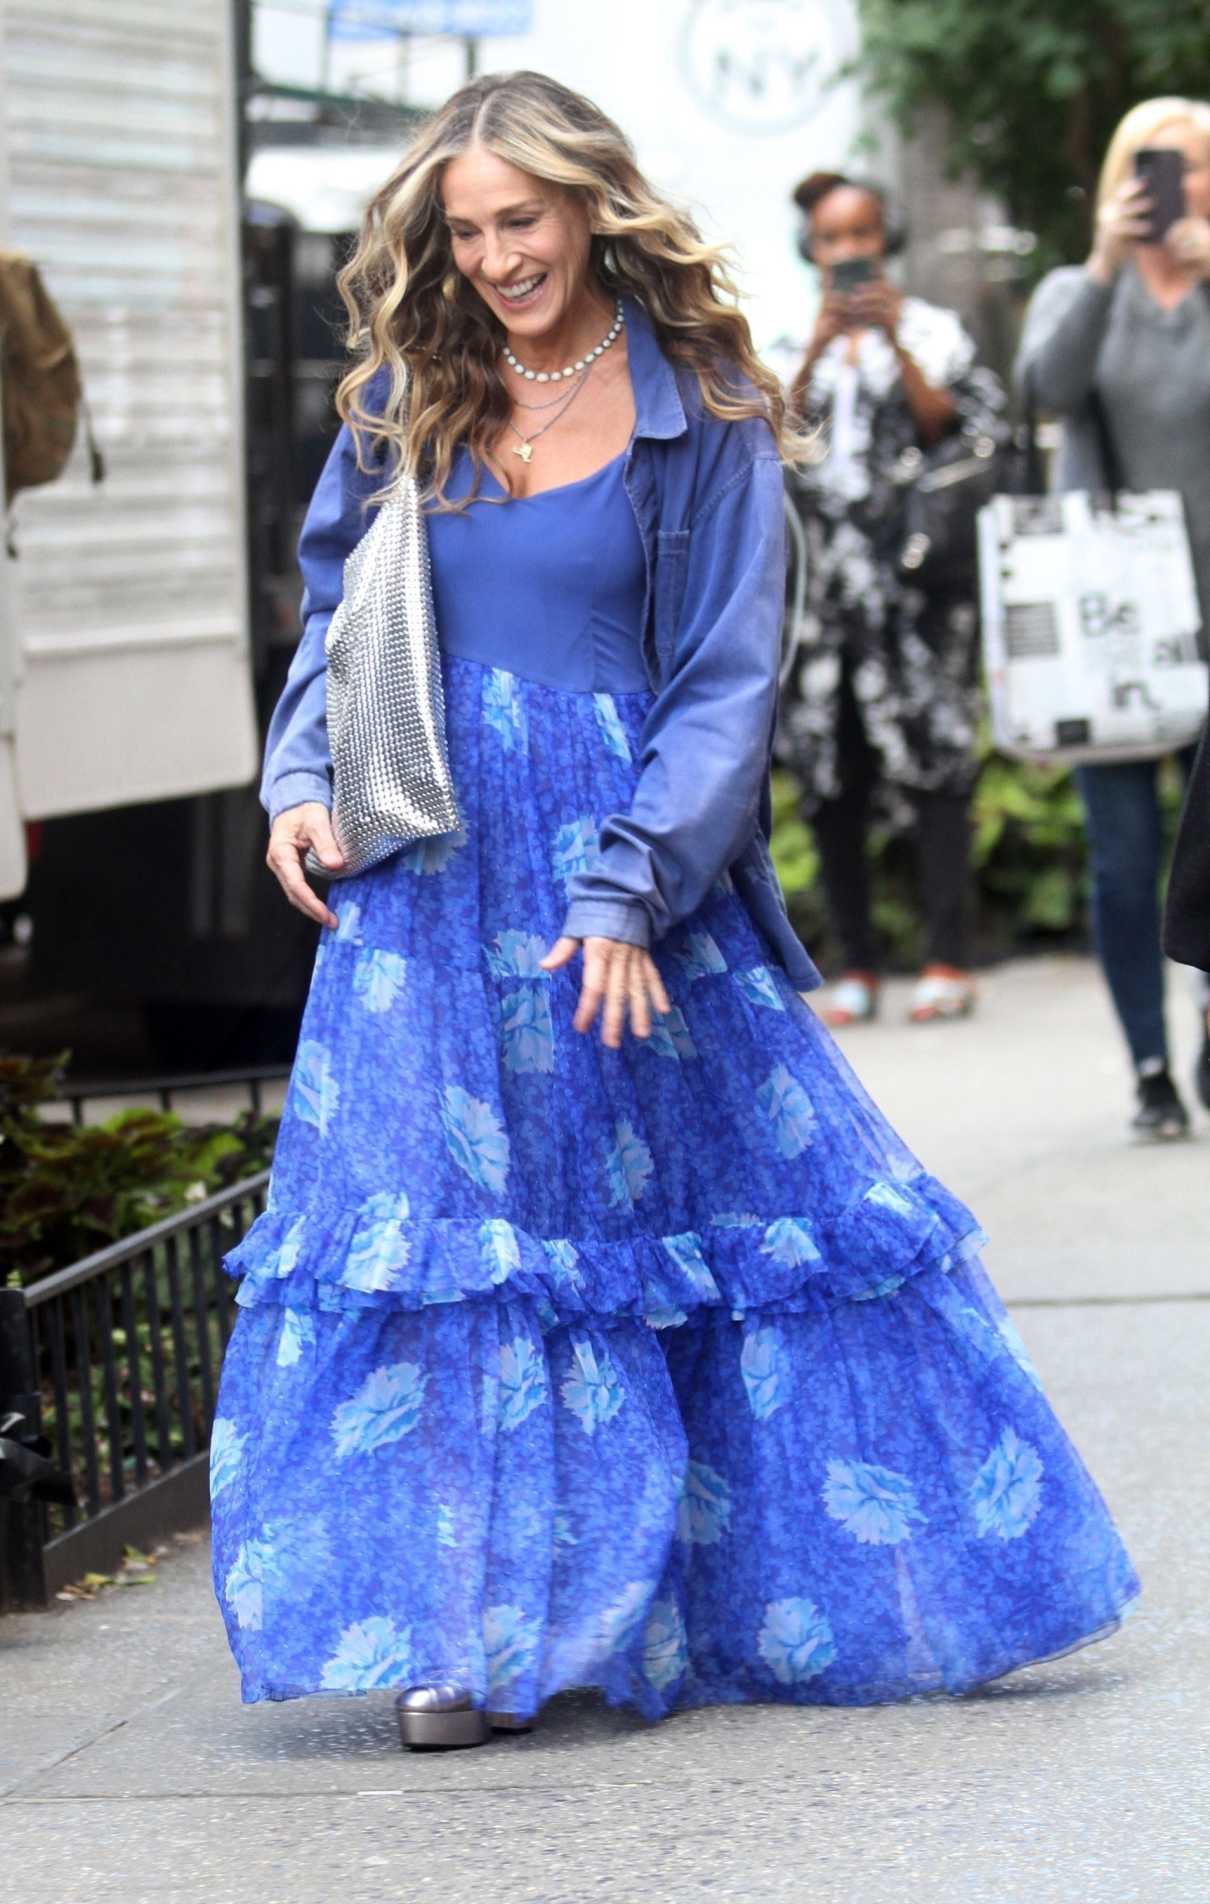 Sarah Jessica Parker in a Blue Dress